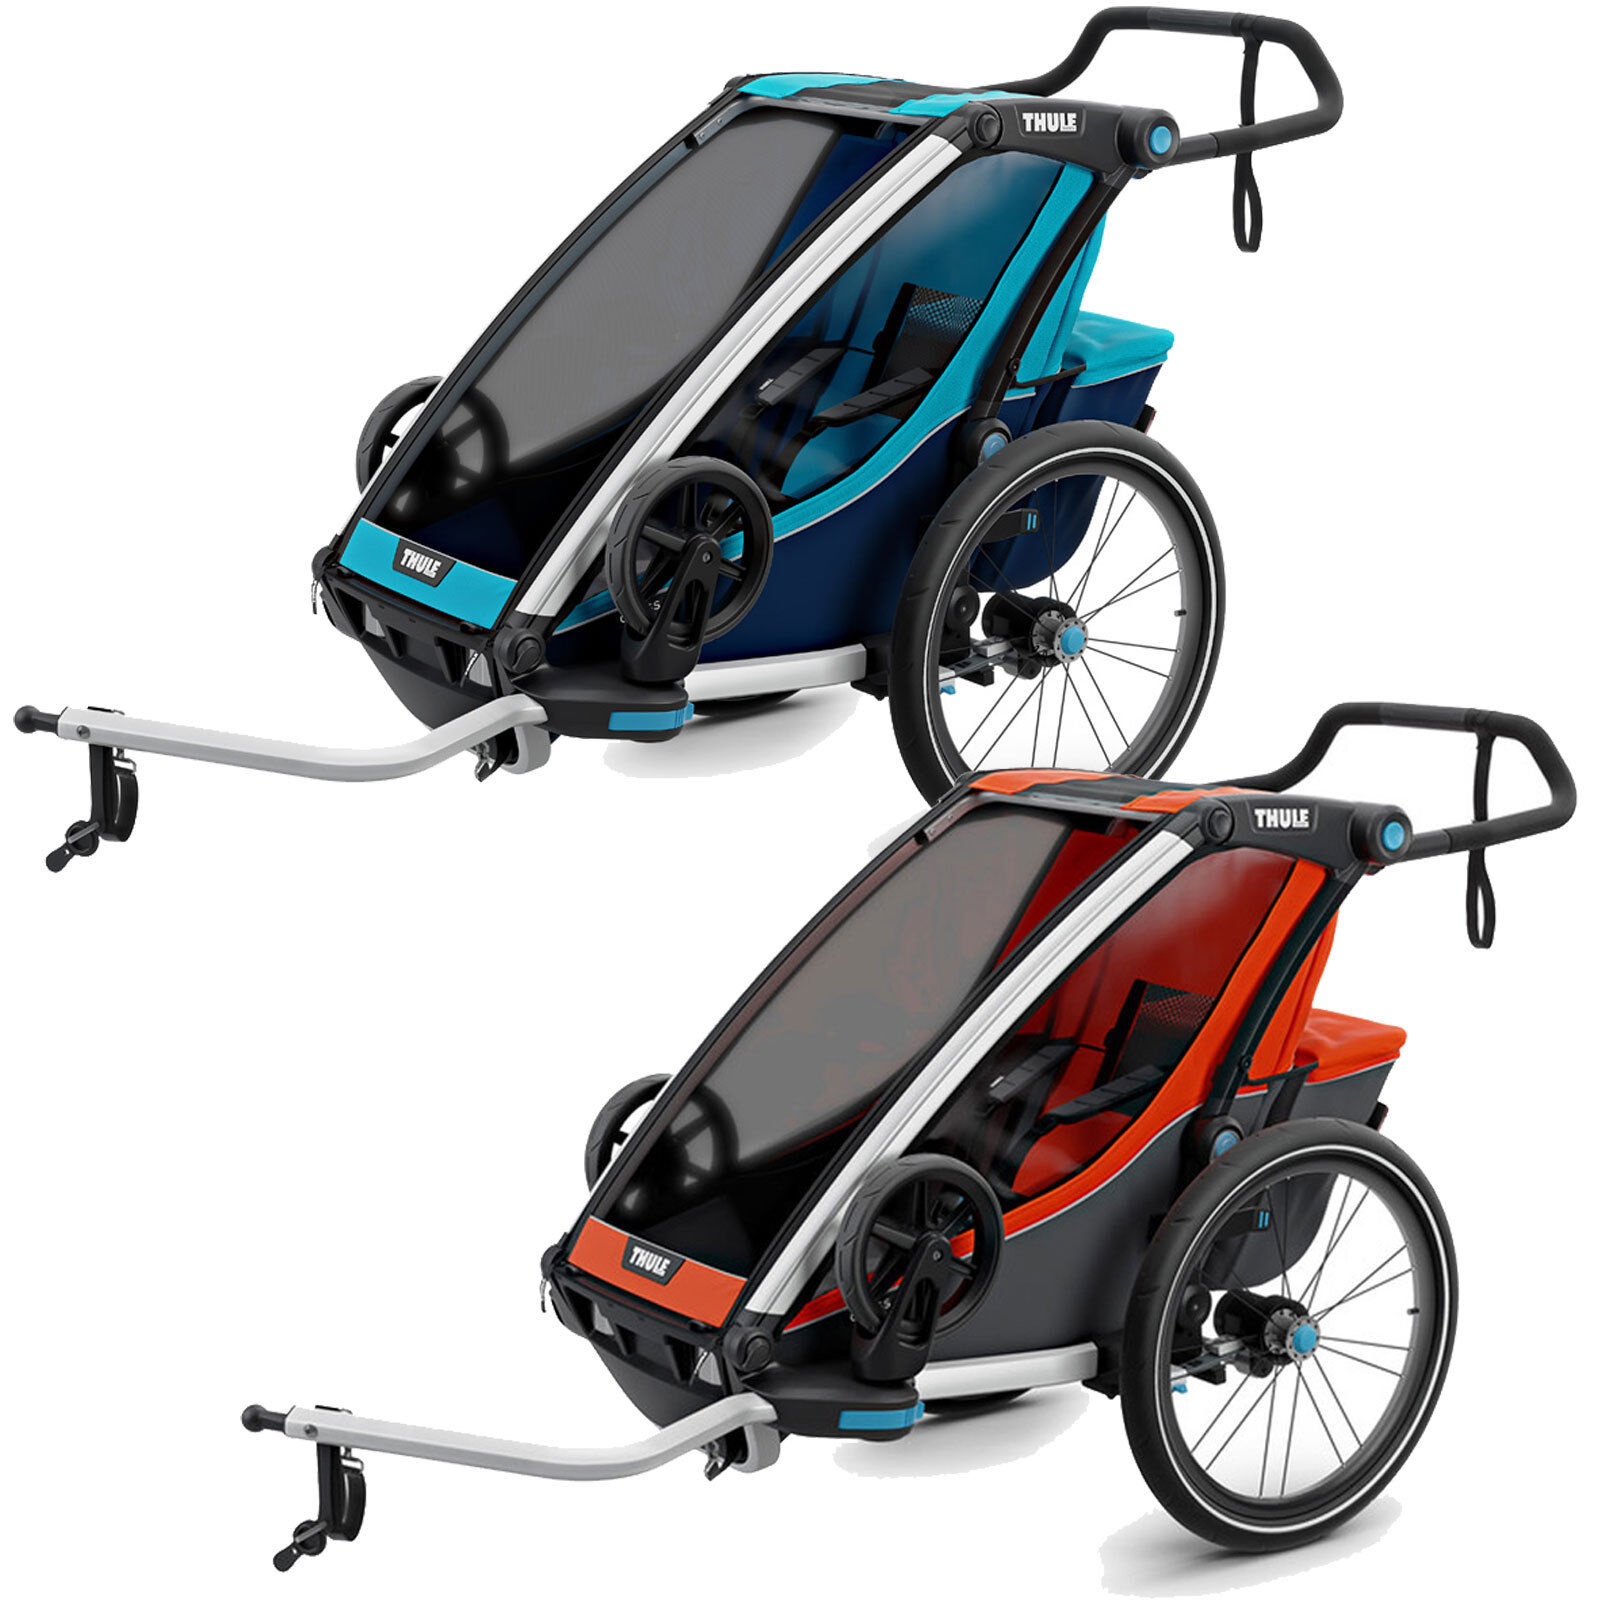 Thule Chariot cross 1 Coupling Kinder-Fahrradanhänger Single-Seater New